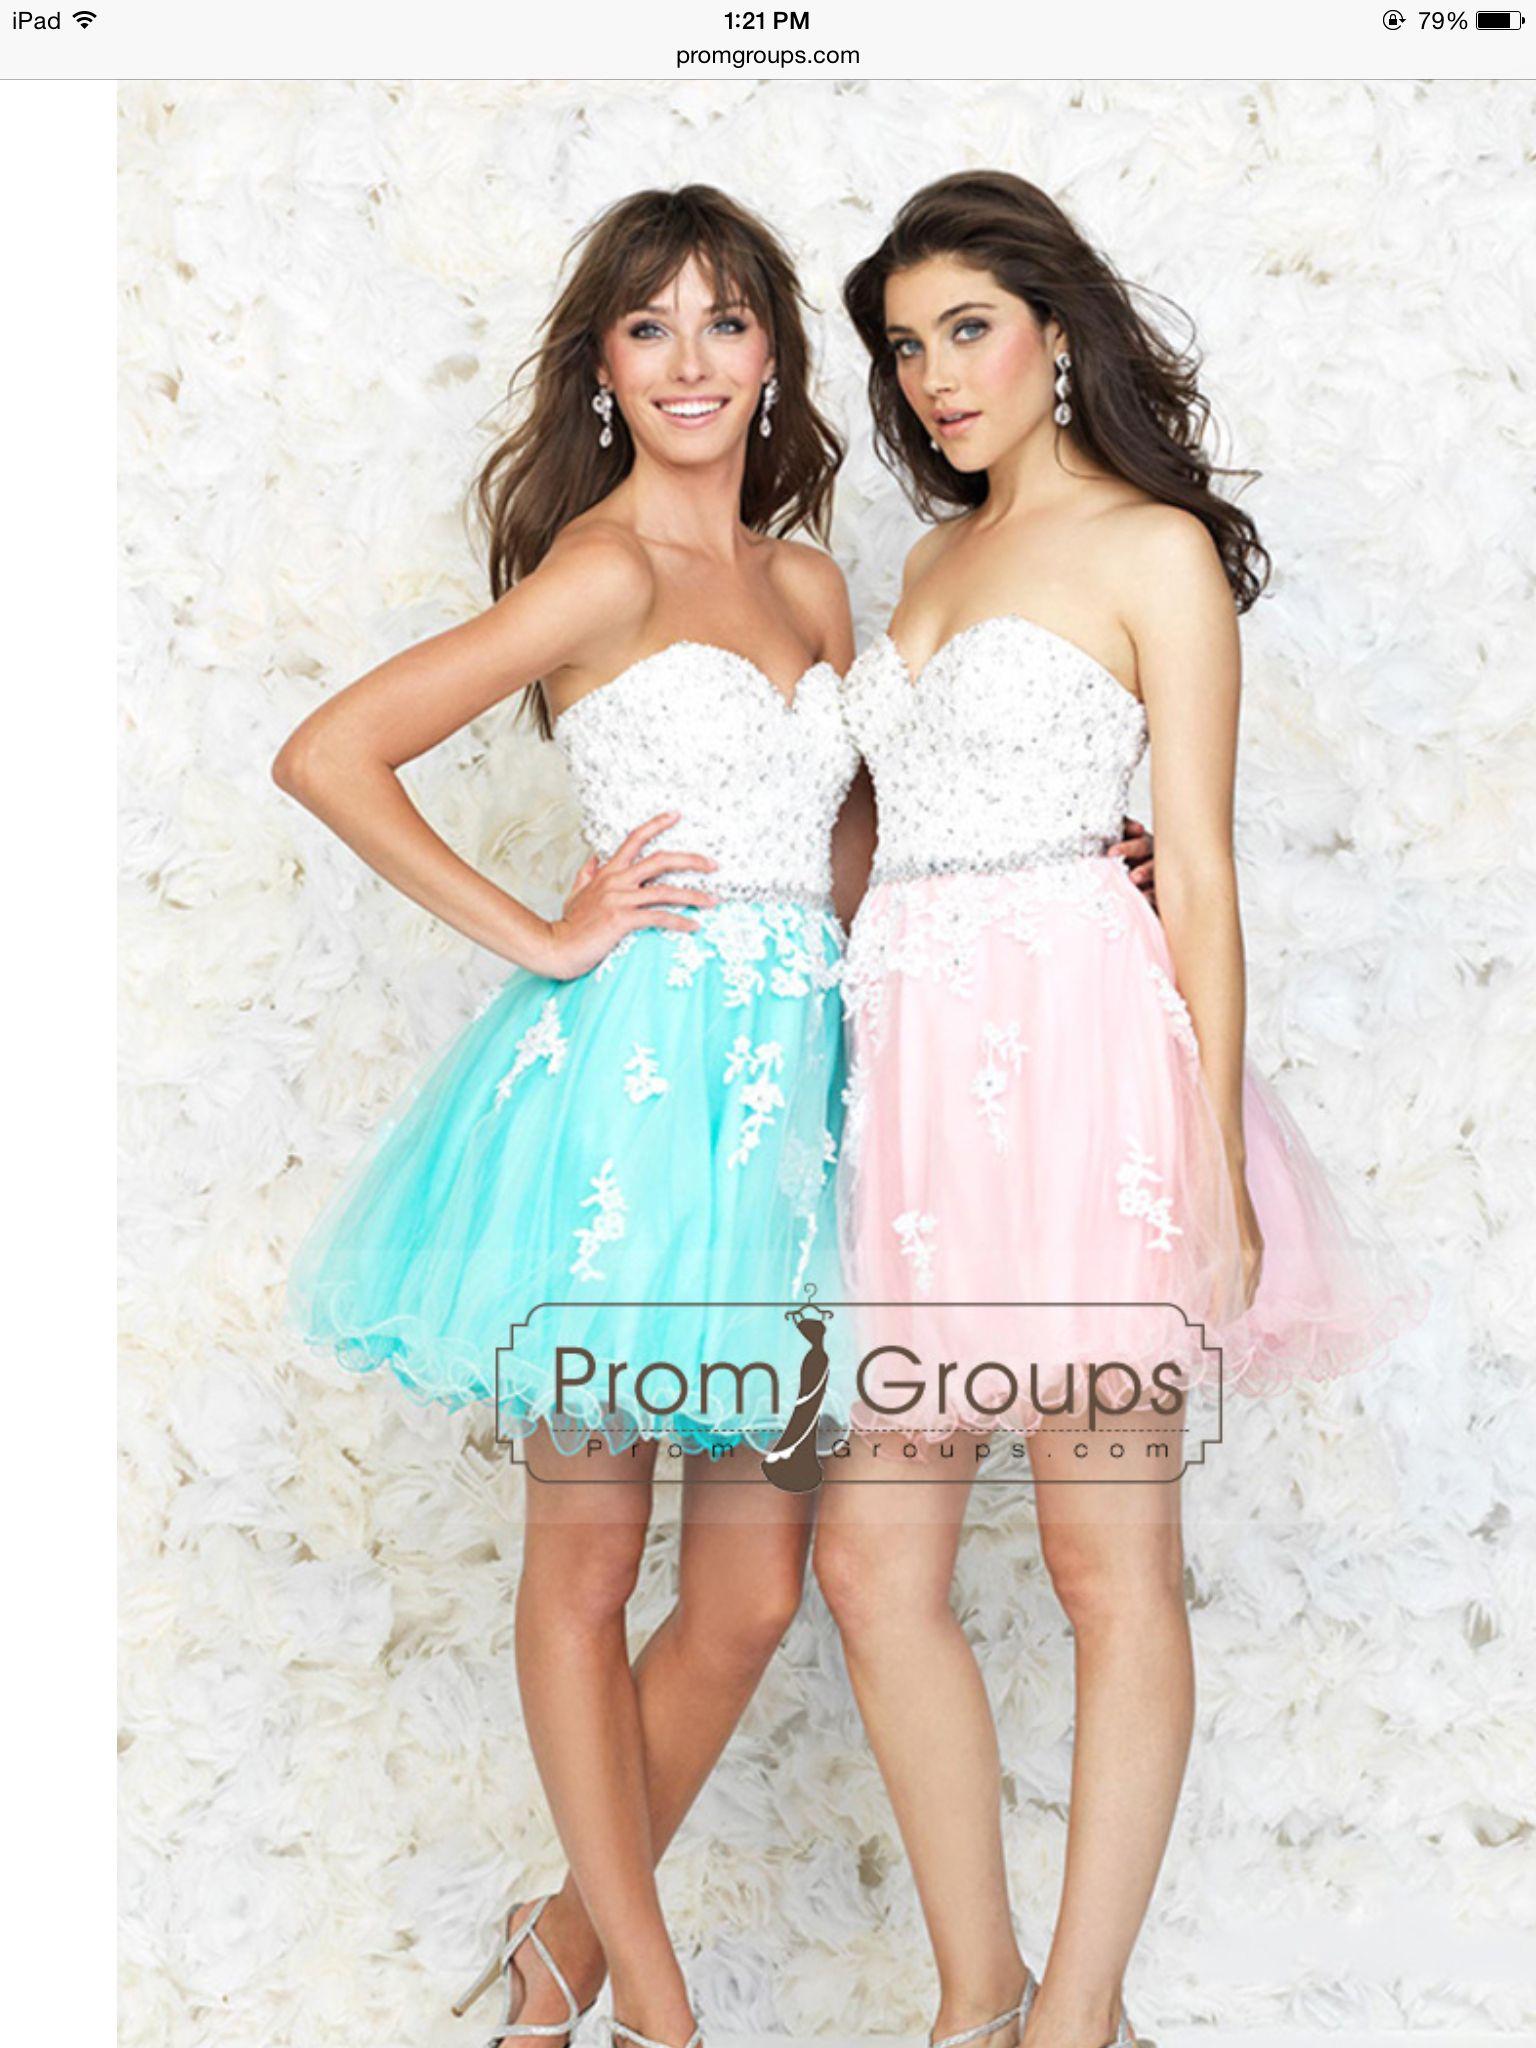 The blue dress | Dresses | Pinterest | Blue dresses and Winter